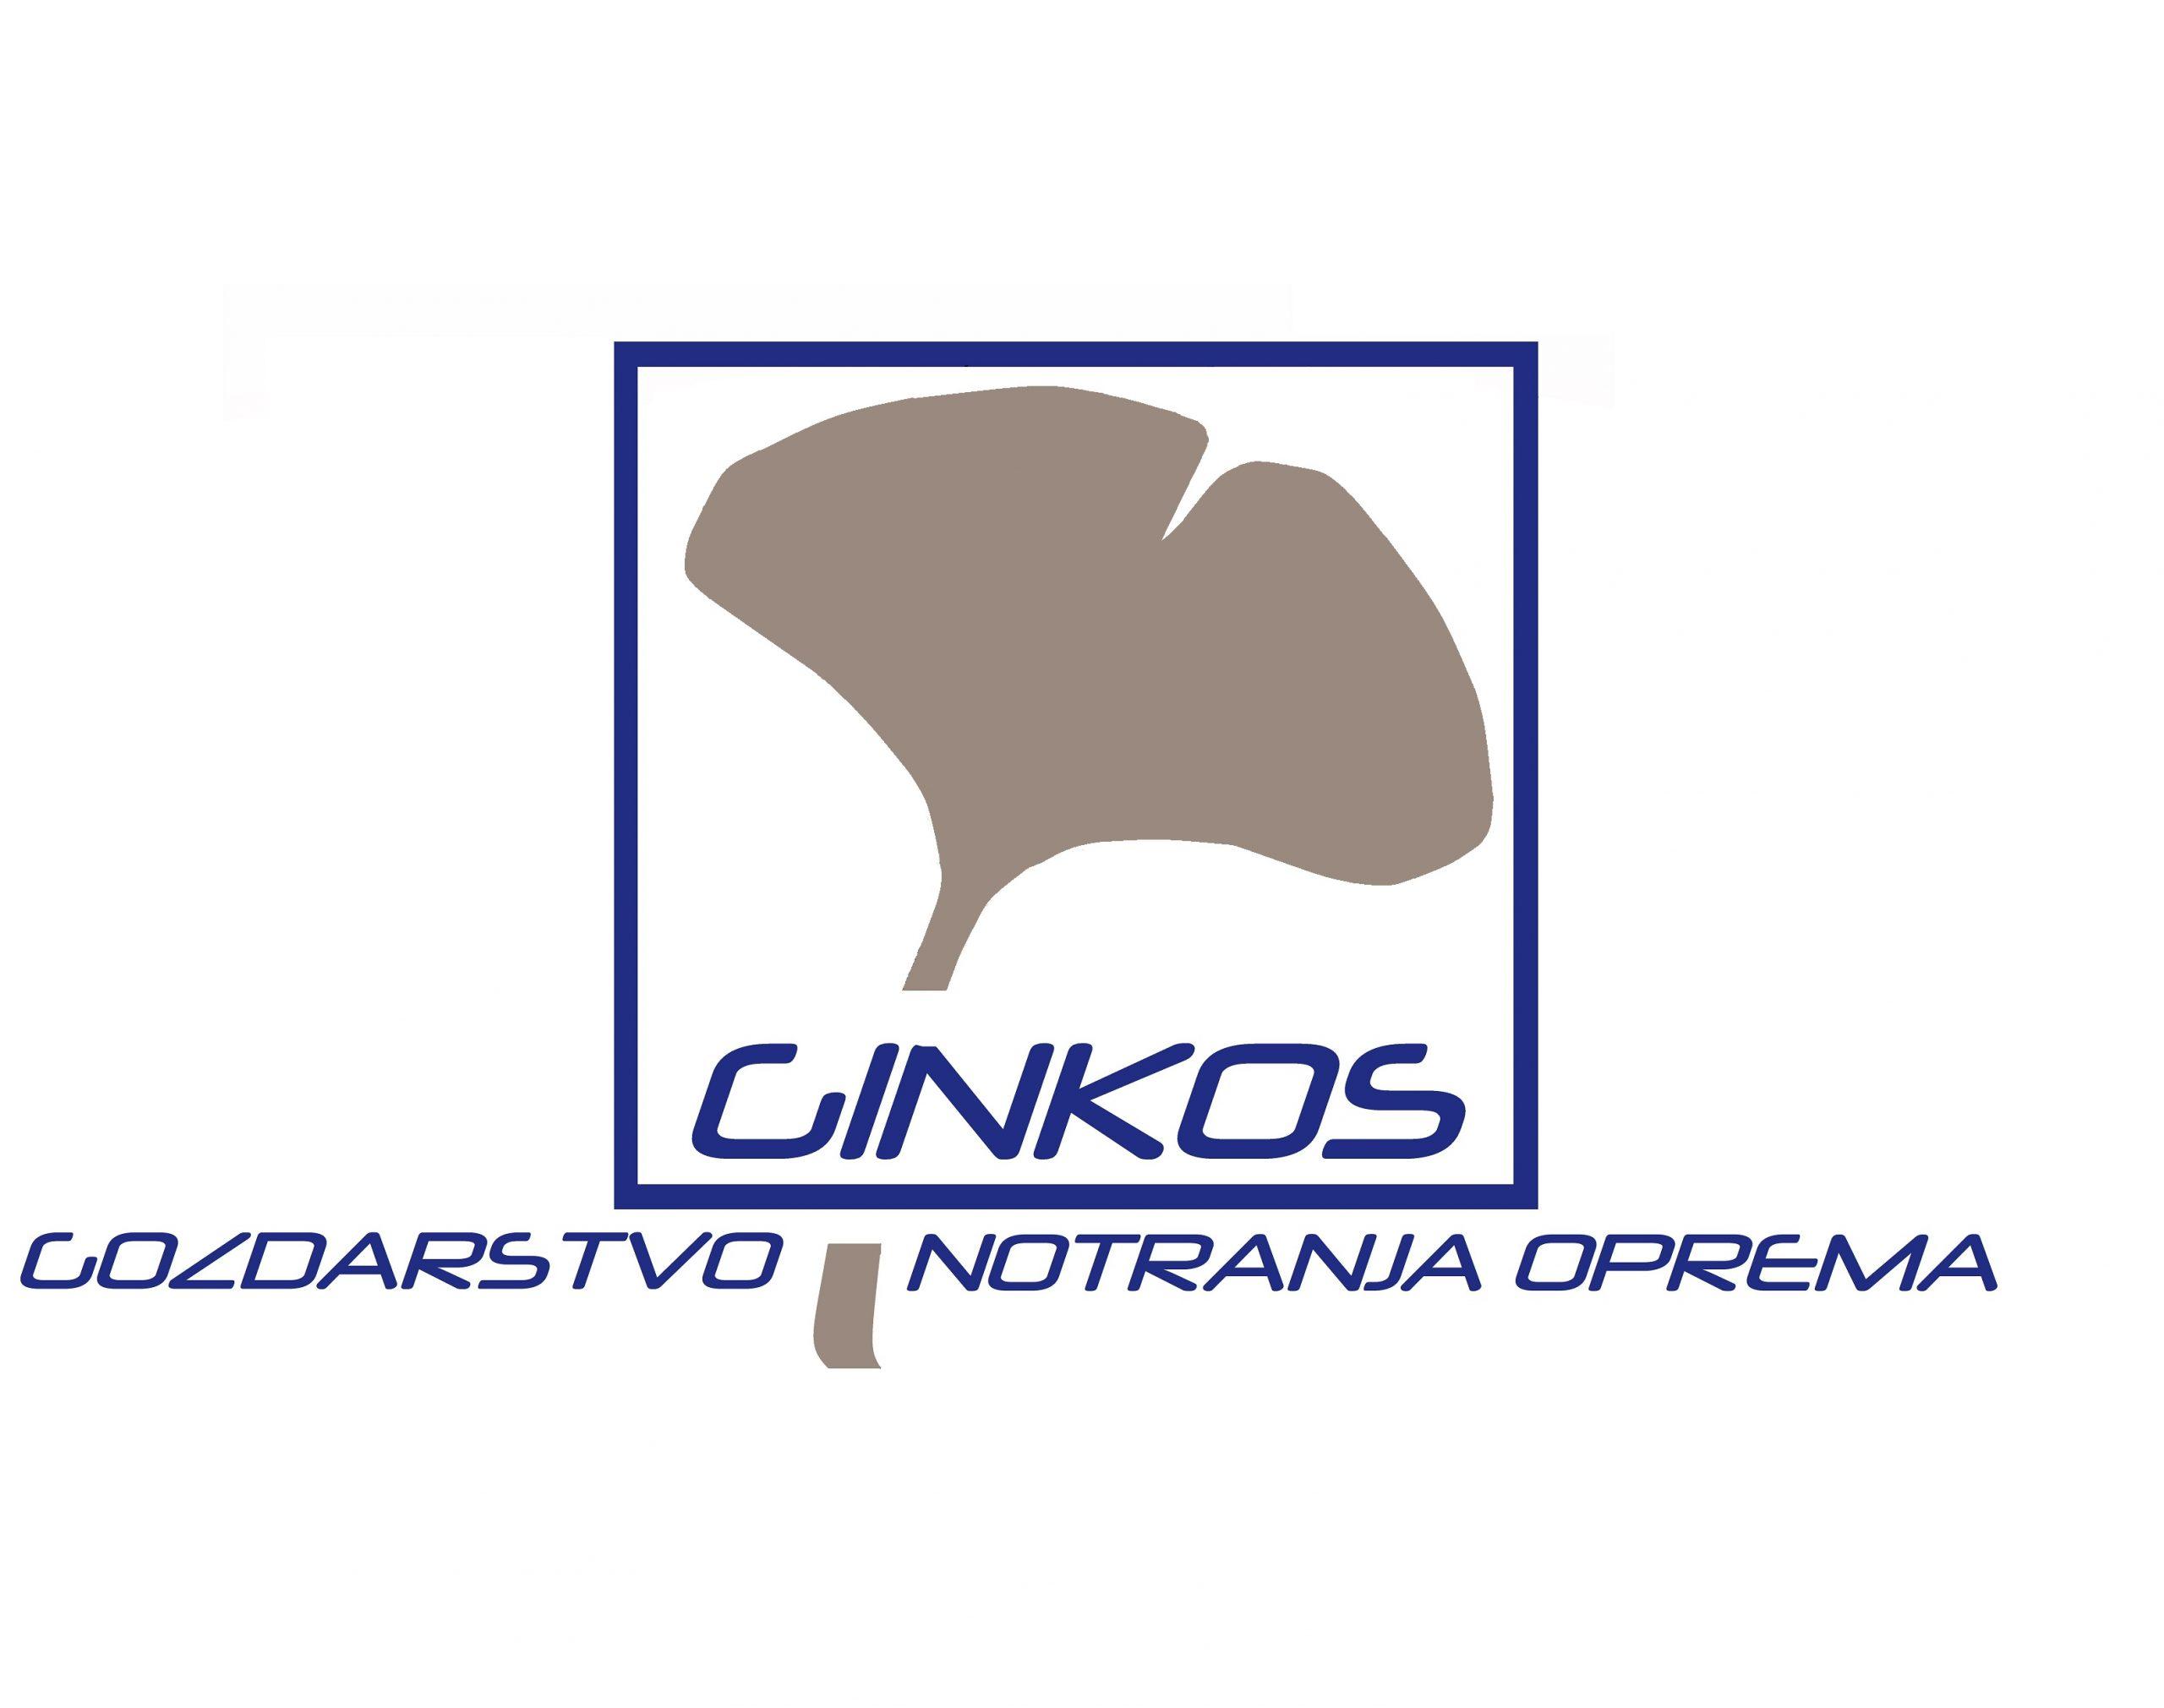 GINKOS d.o.o.